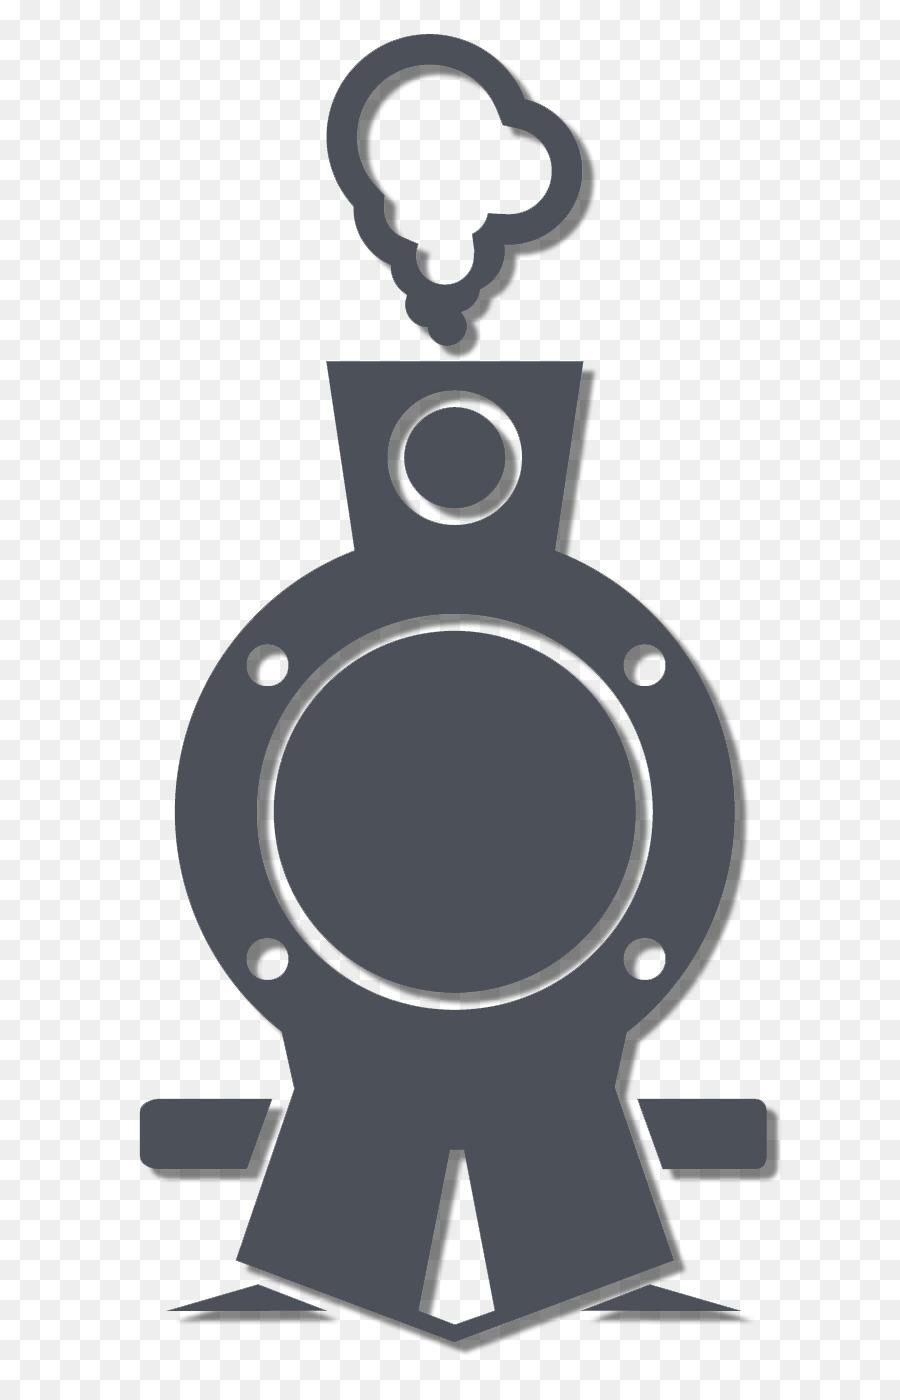 900x1400 Train Rail Transport Steam Locomotive